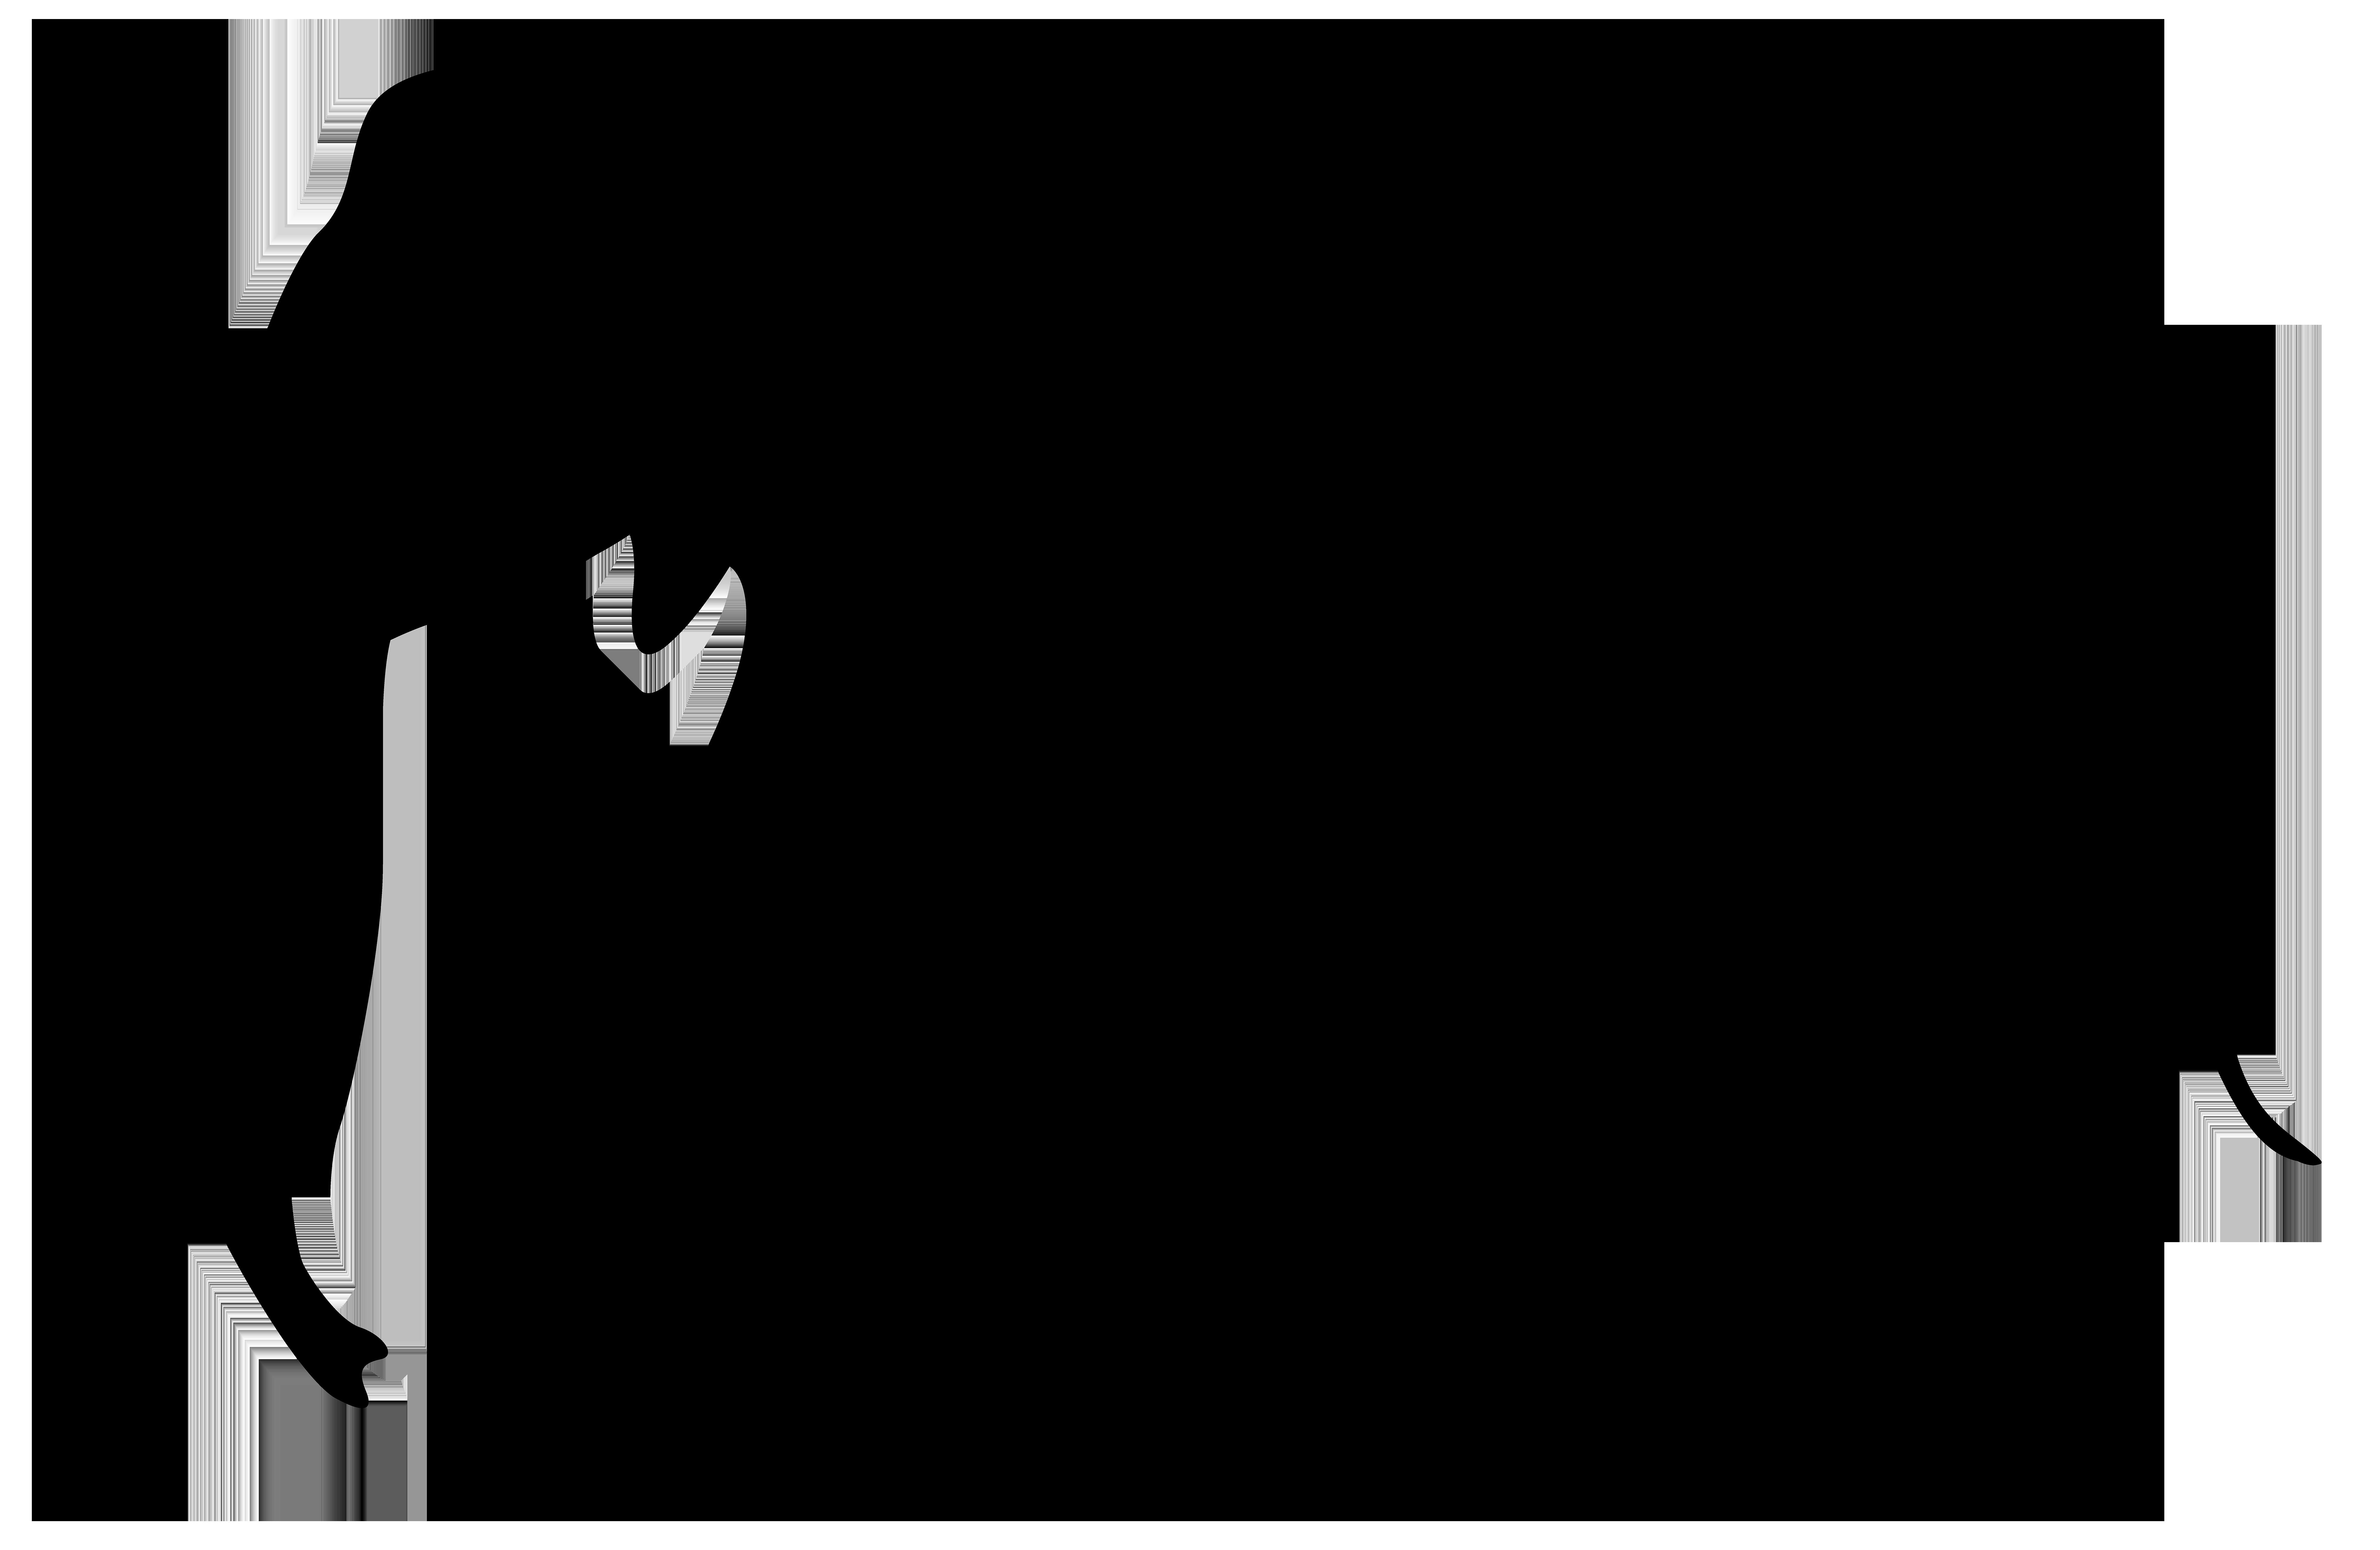 Elephant Silhouette PNG Clip Art Image.